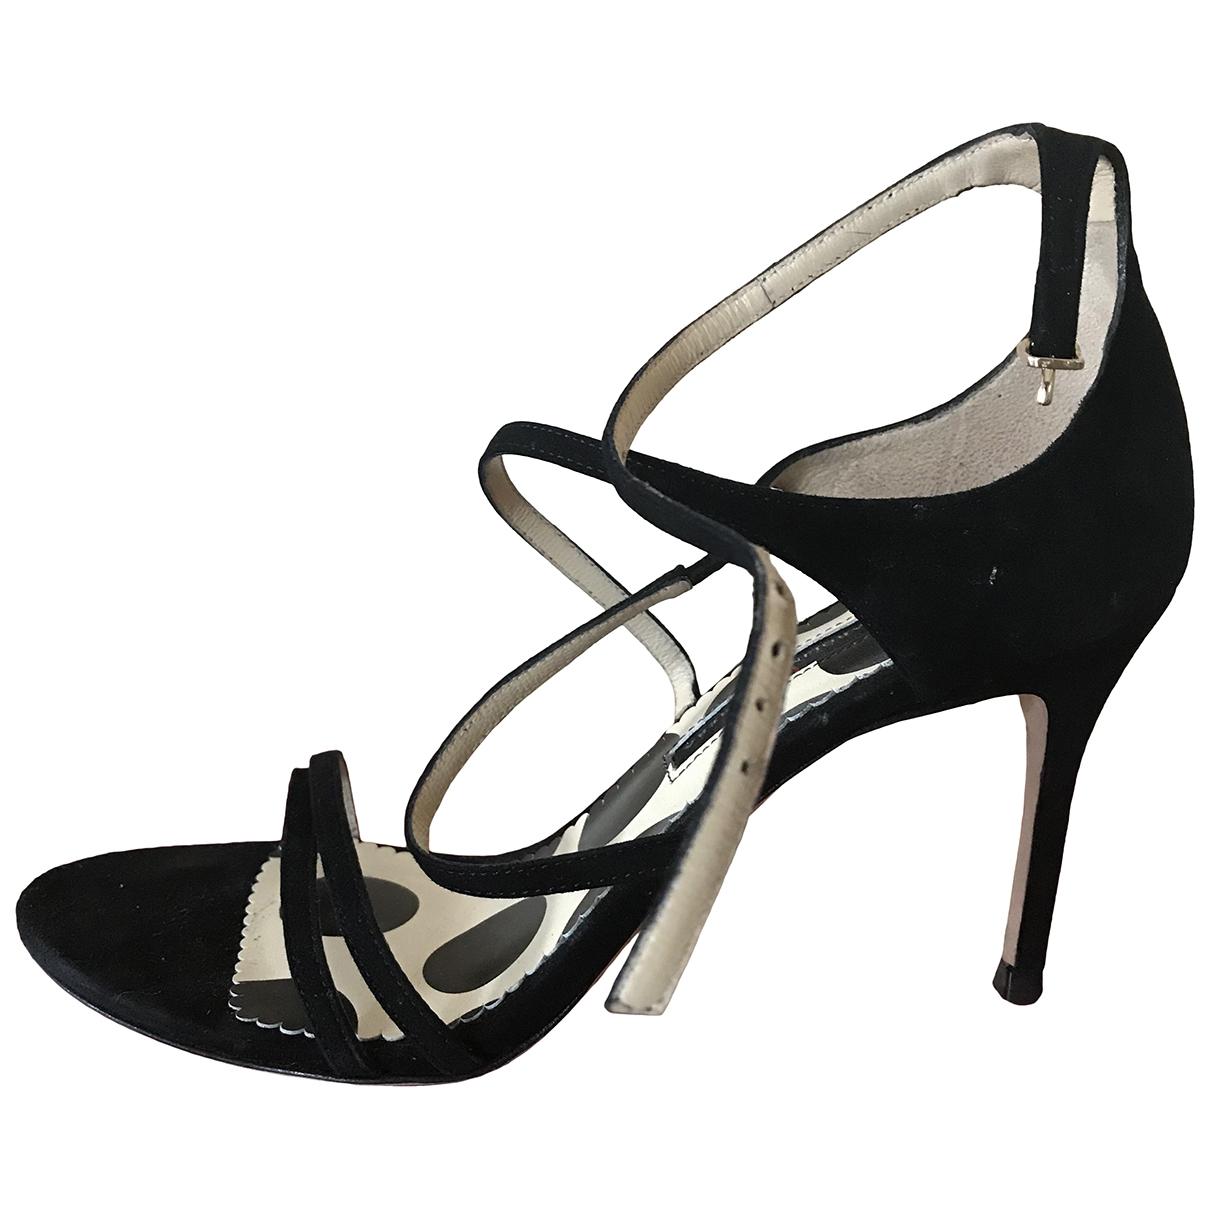 Carolina Herrera - Sandales   pour femme en suede - noir